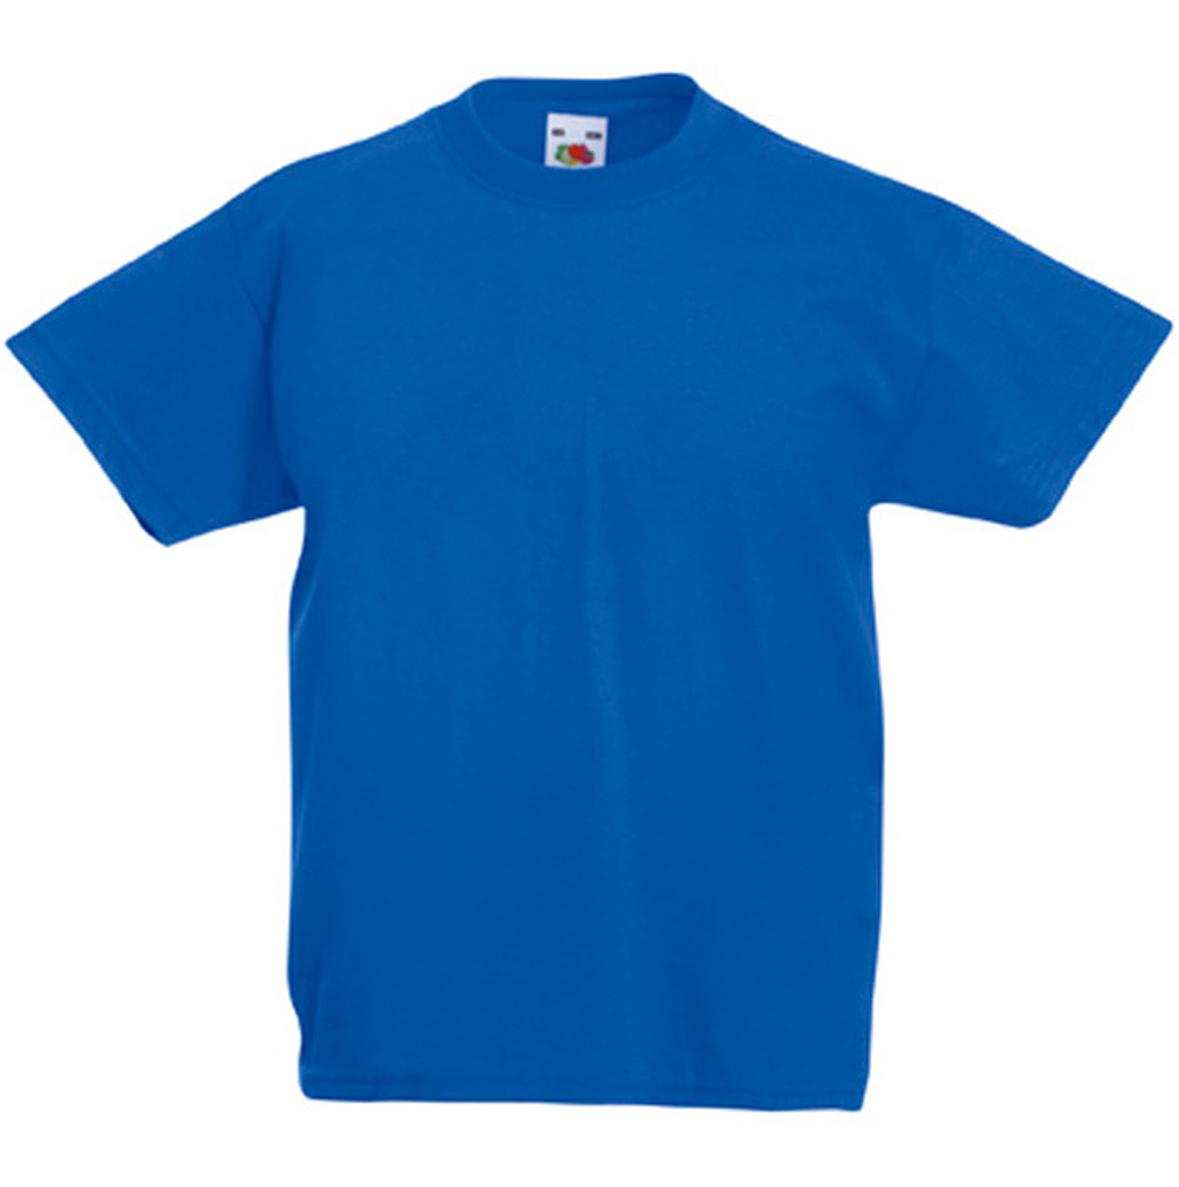 f2f6e60def9d4 Печать на футболках и майках в СПб, распечатать фото на футболке ...